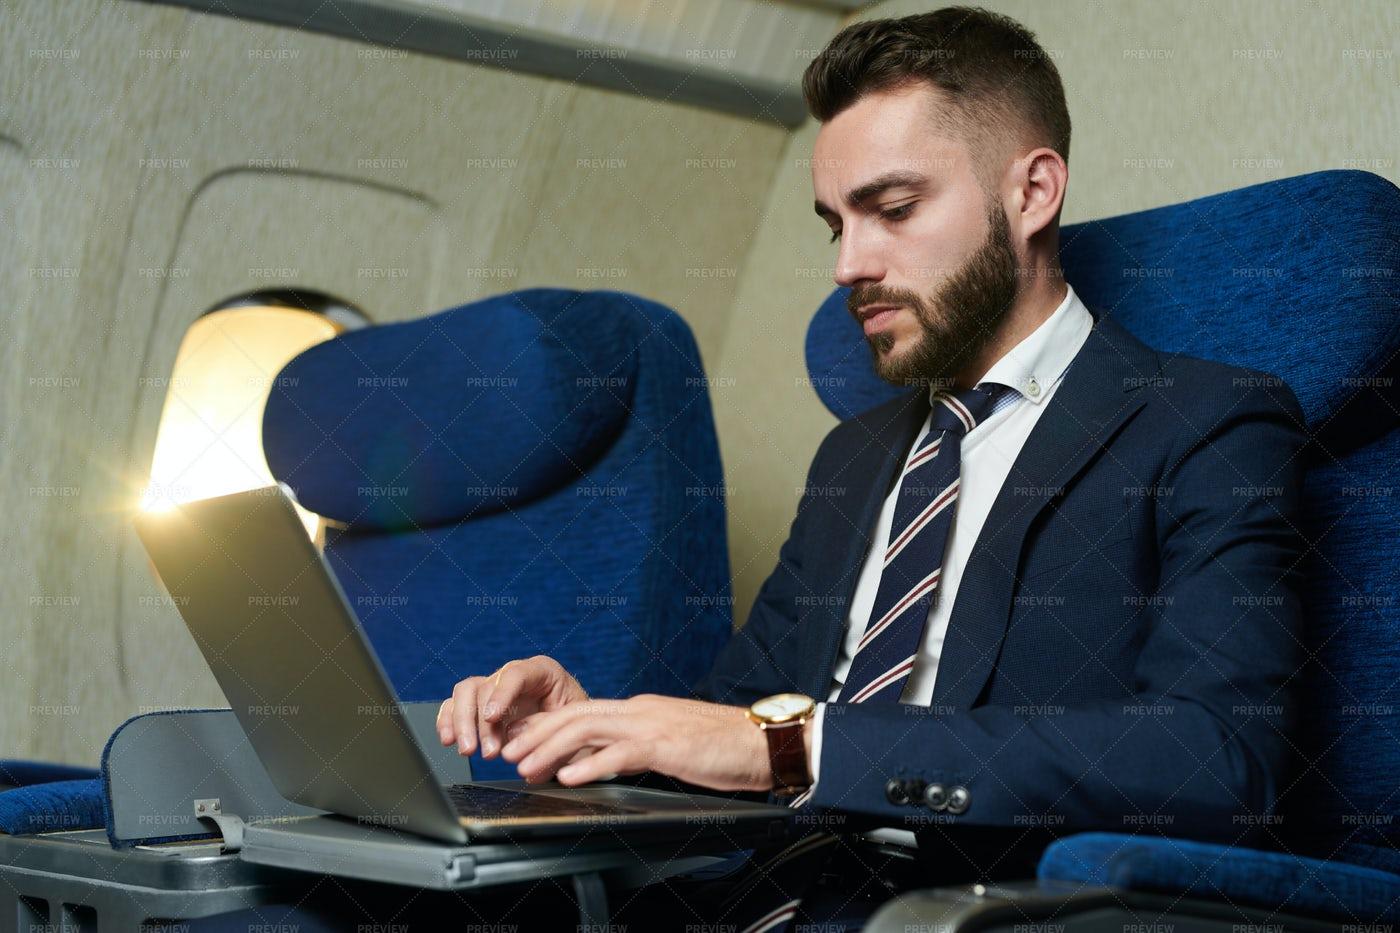 Businessman Working In Plane: Stock Photos